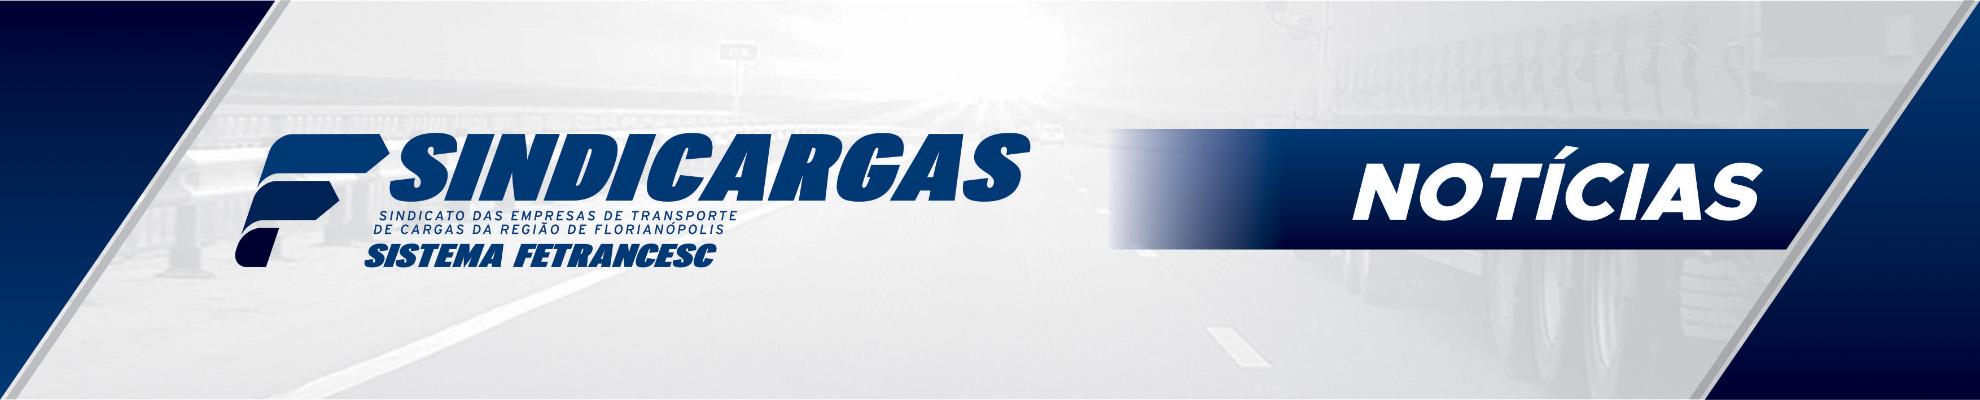 http://sindicargas.com.br/noticias